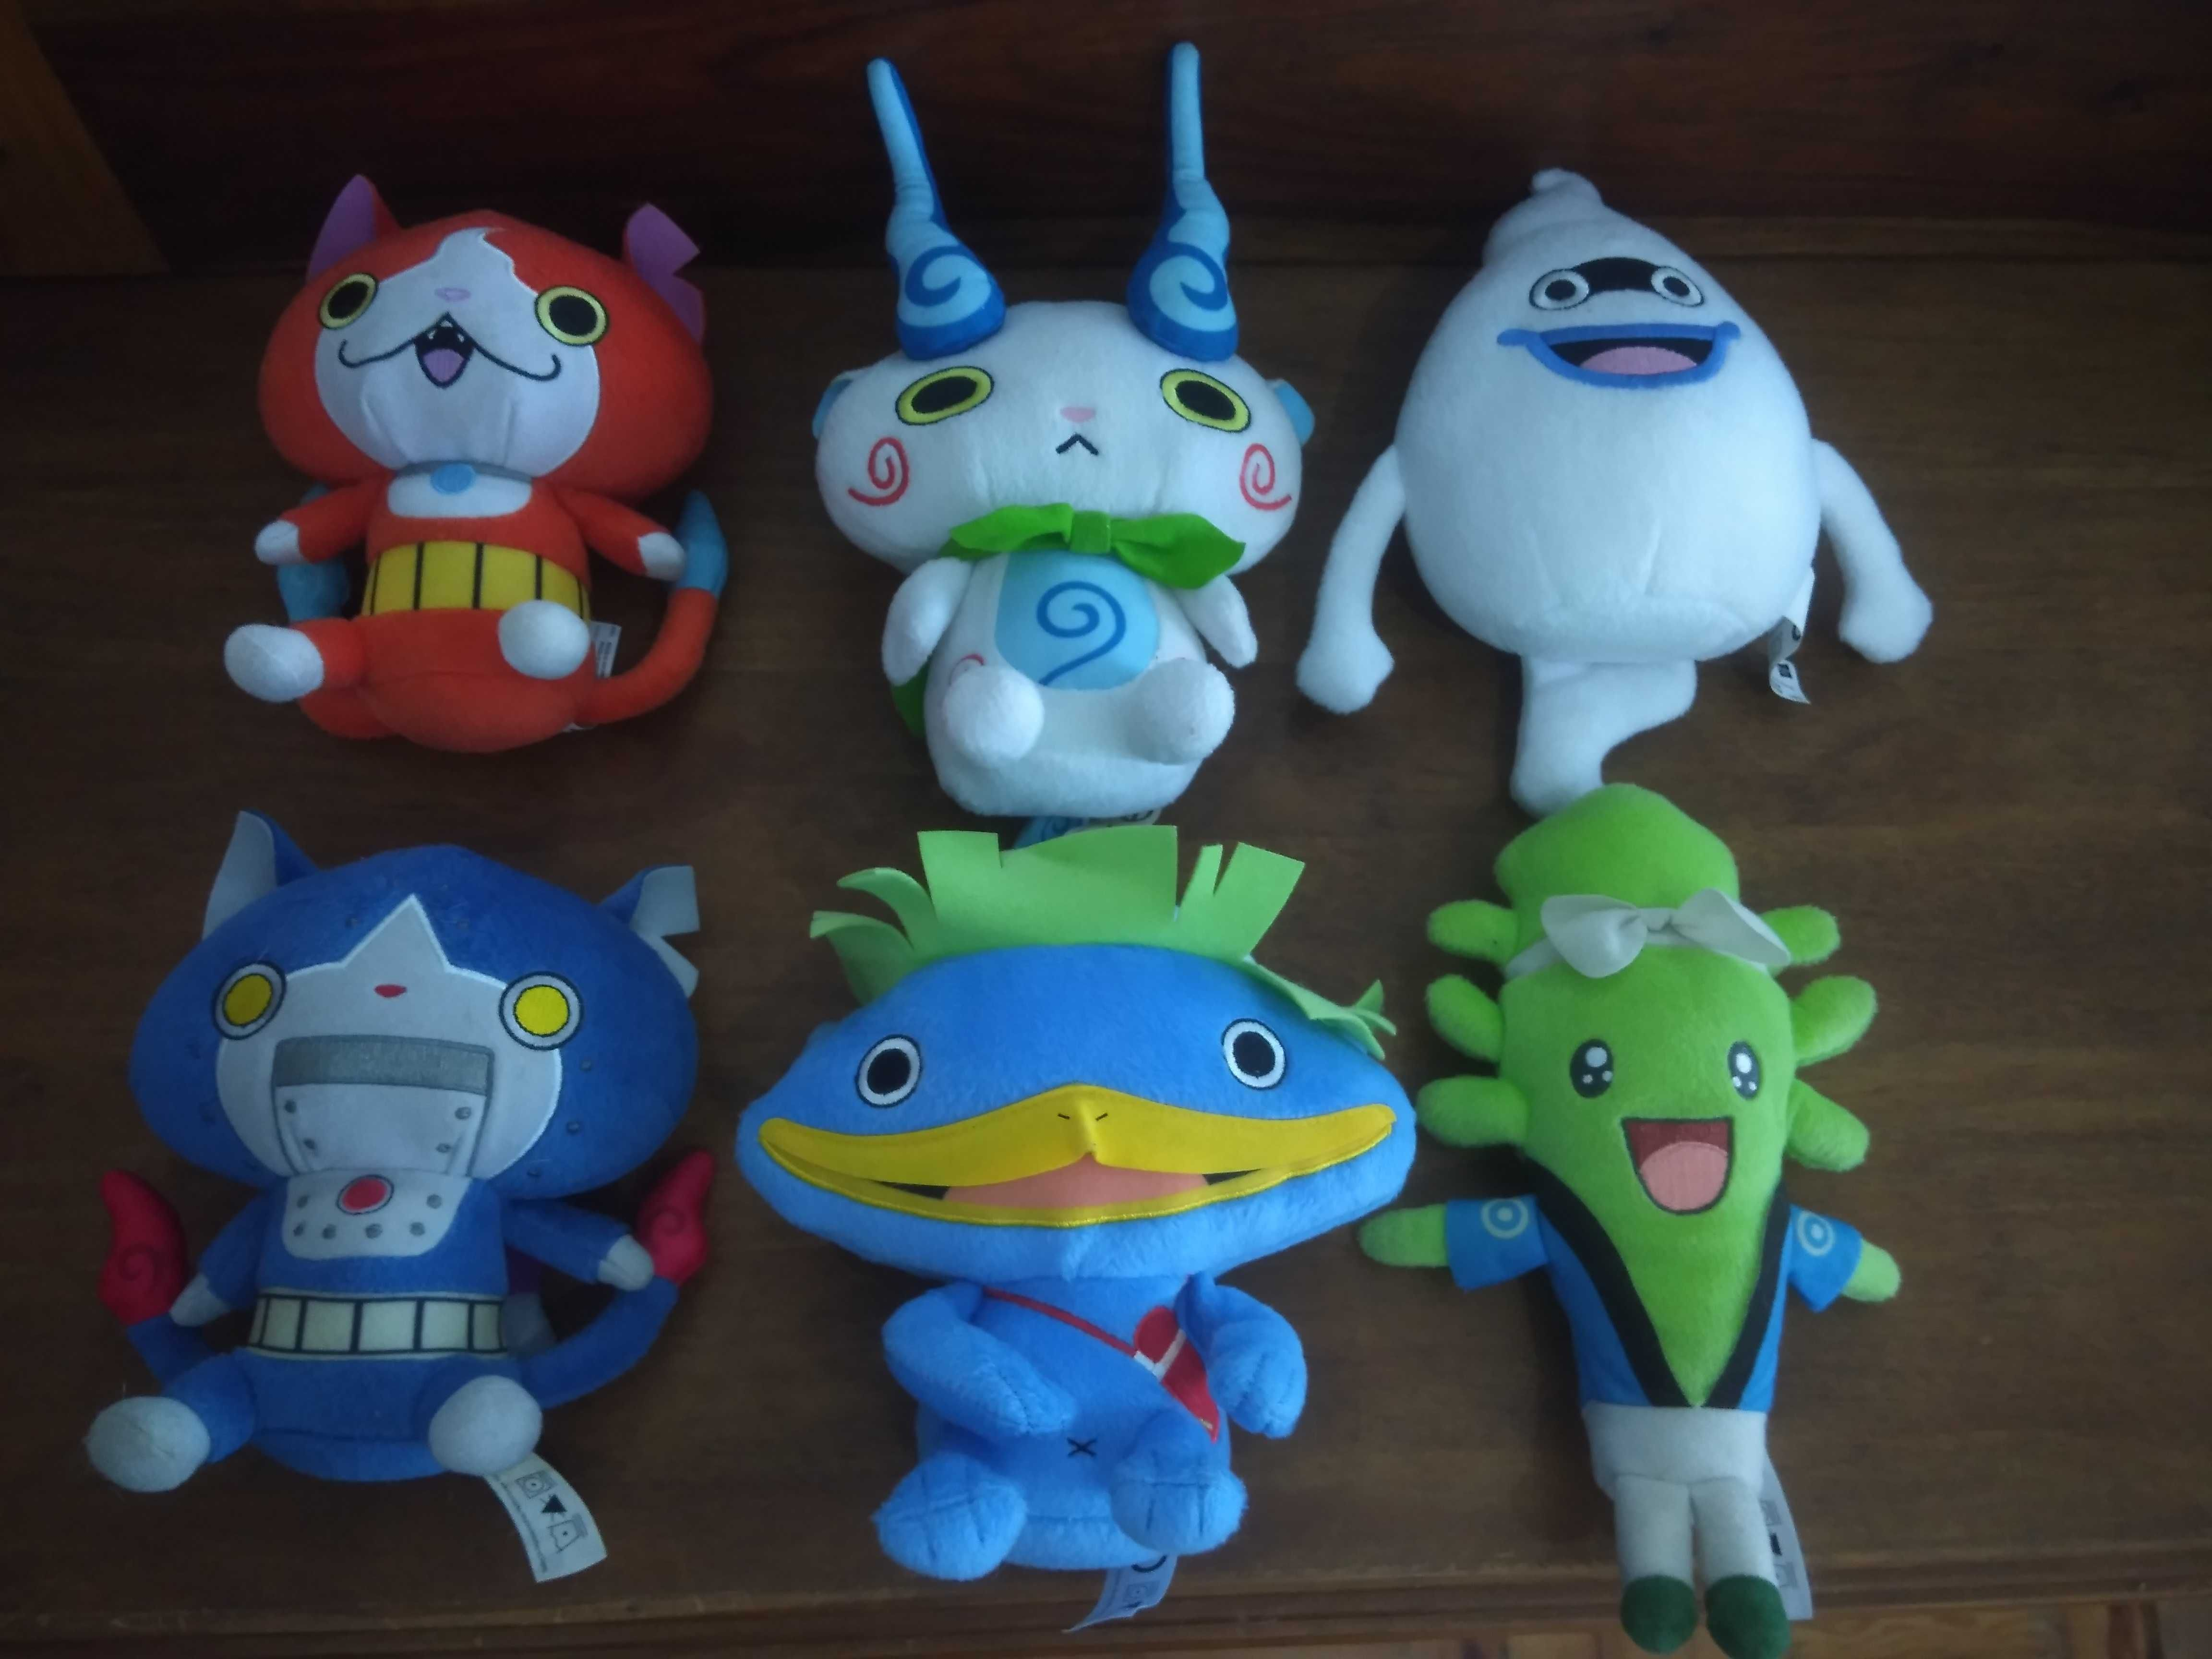 Peluches Super Mario, Sonic, Yokai Watch, Marvel, Angry birds